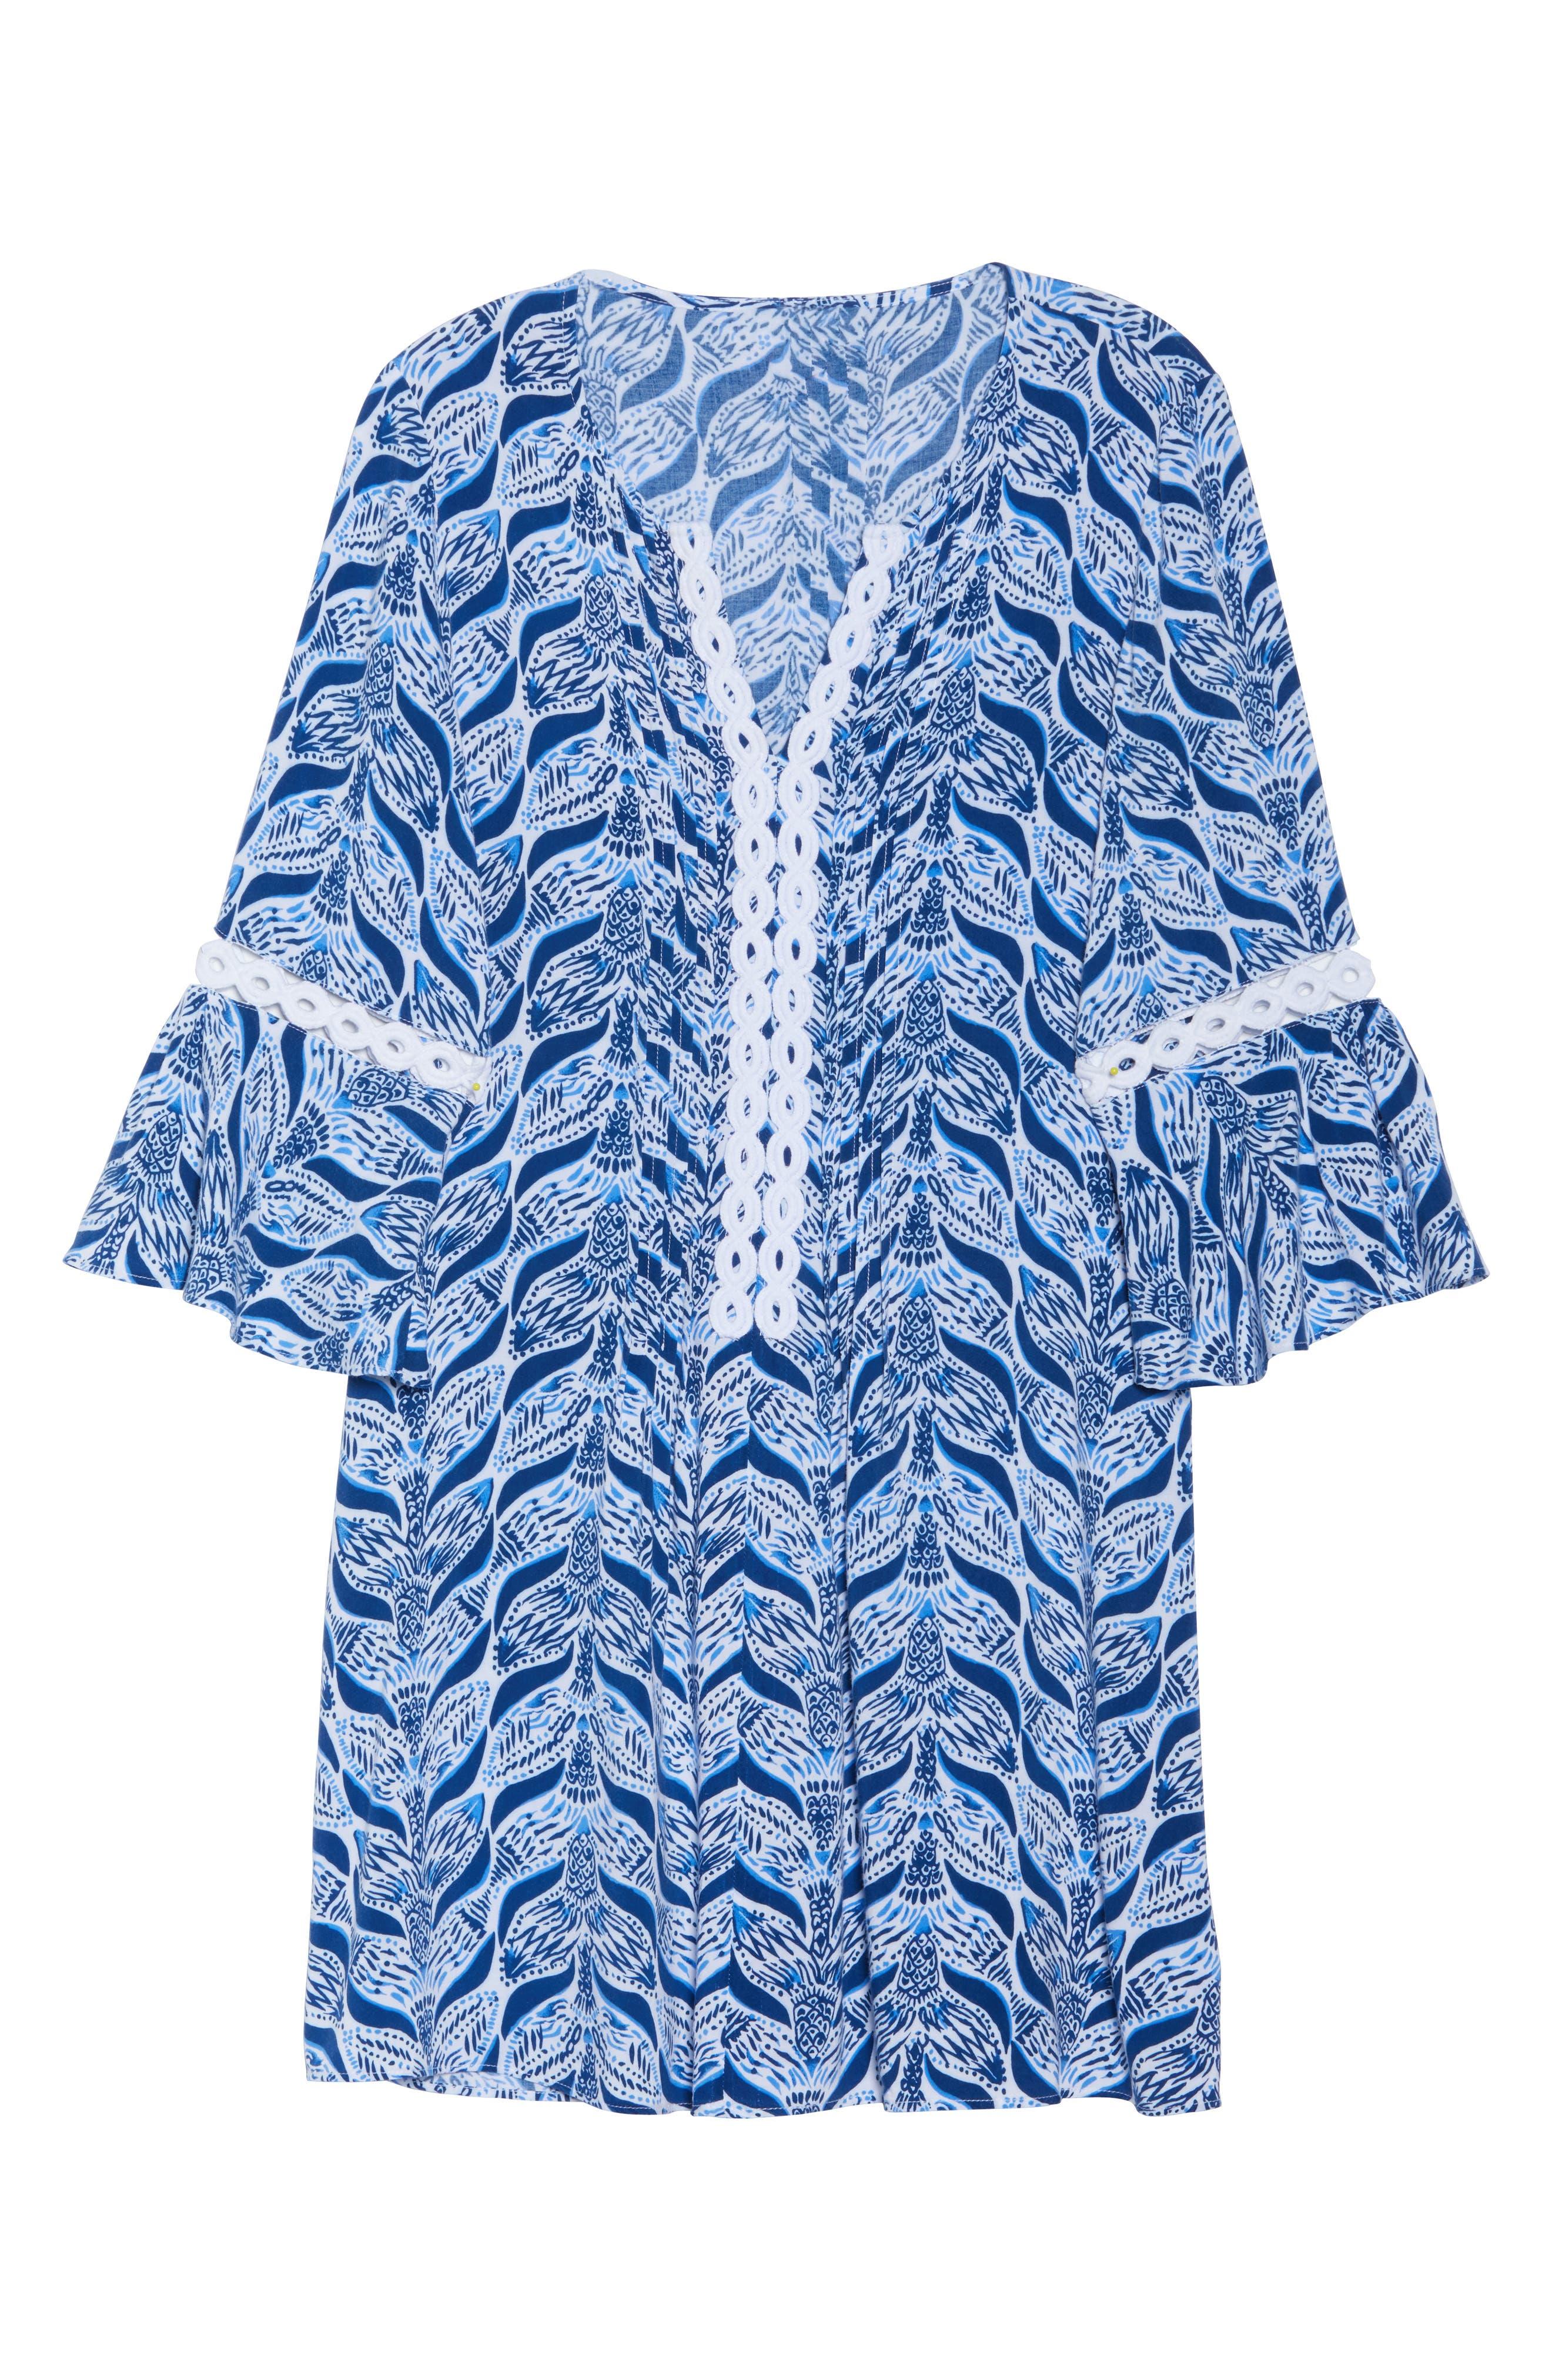 Hollie Tunic Dress,                             Alternate thumbnail 6, color,                             RESORT WHITE A MERMAIDS TAIL